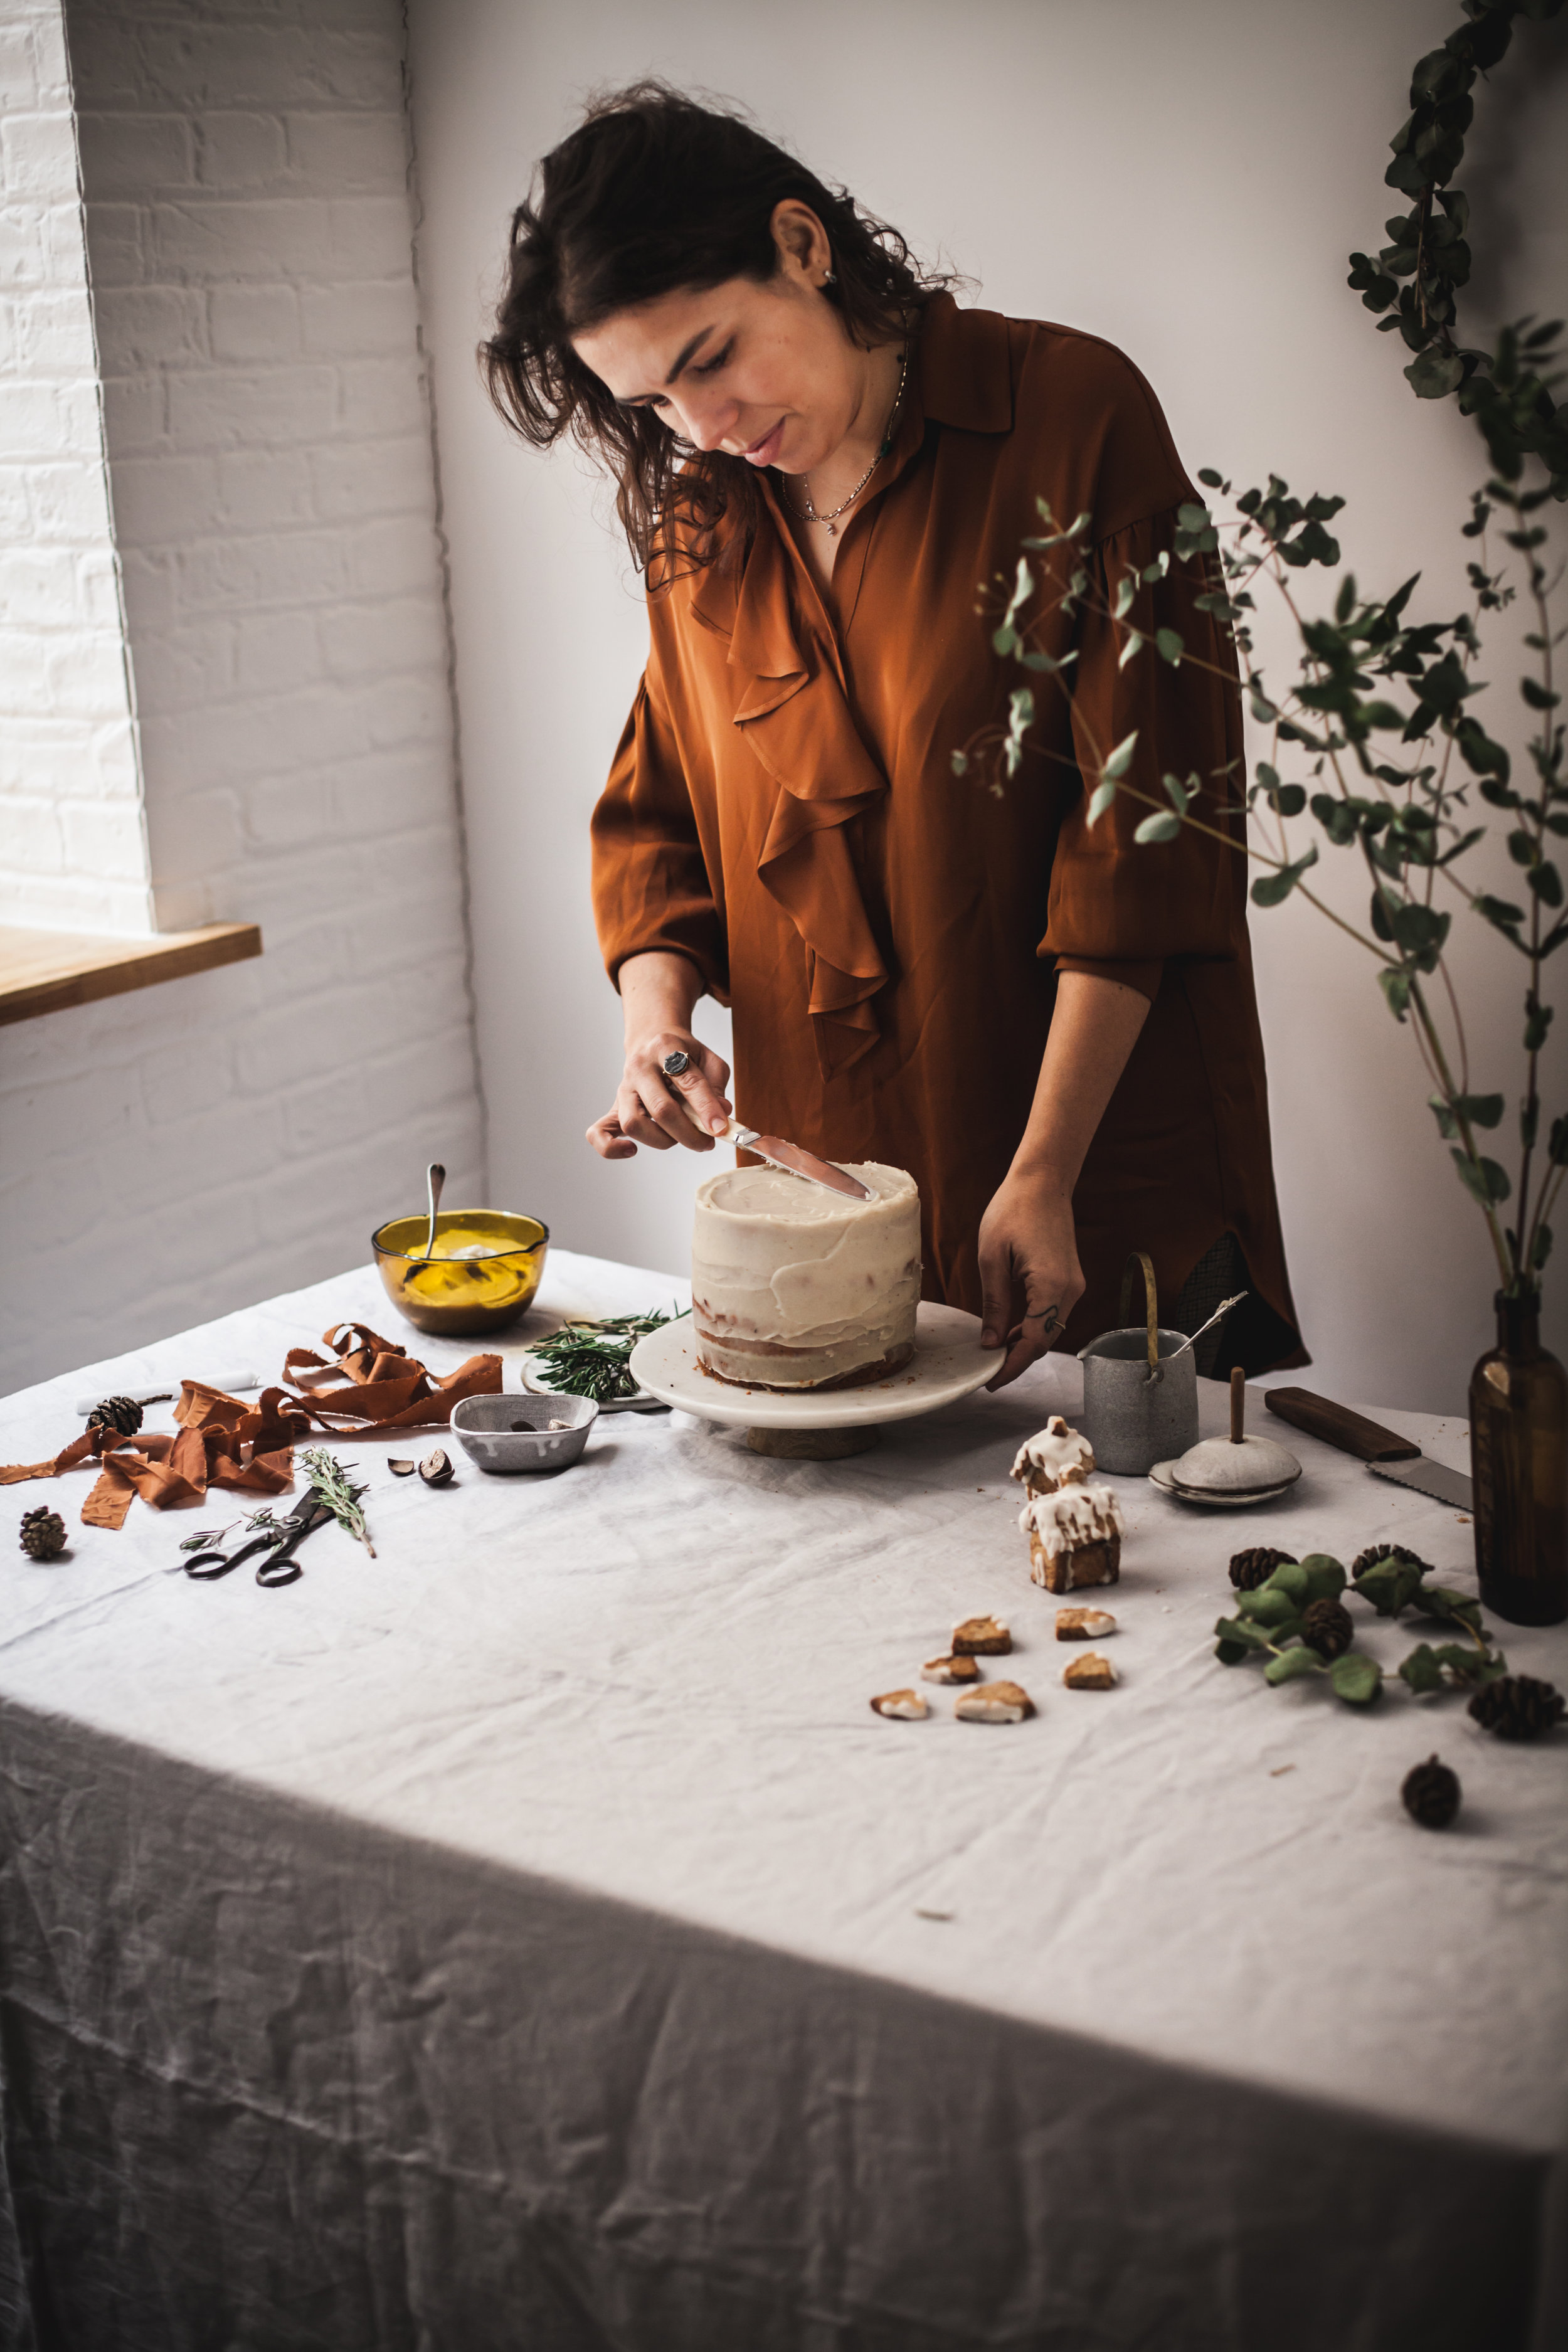 december workshop and Christmas cake recipe #vegan